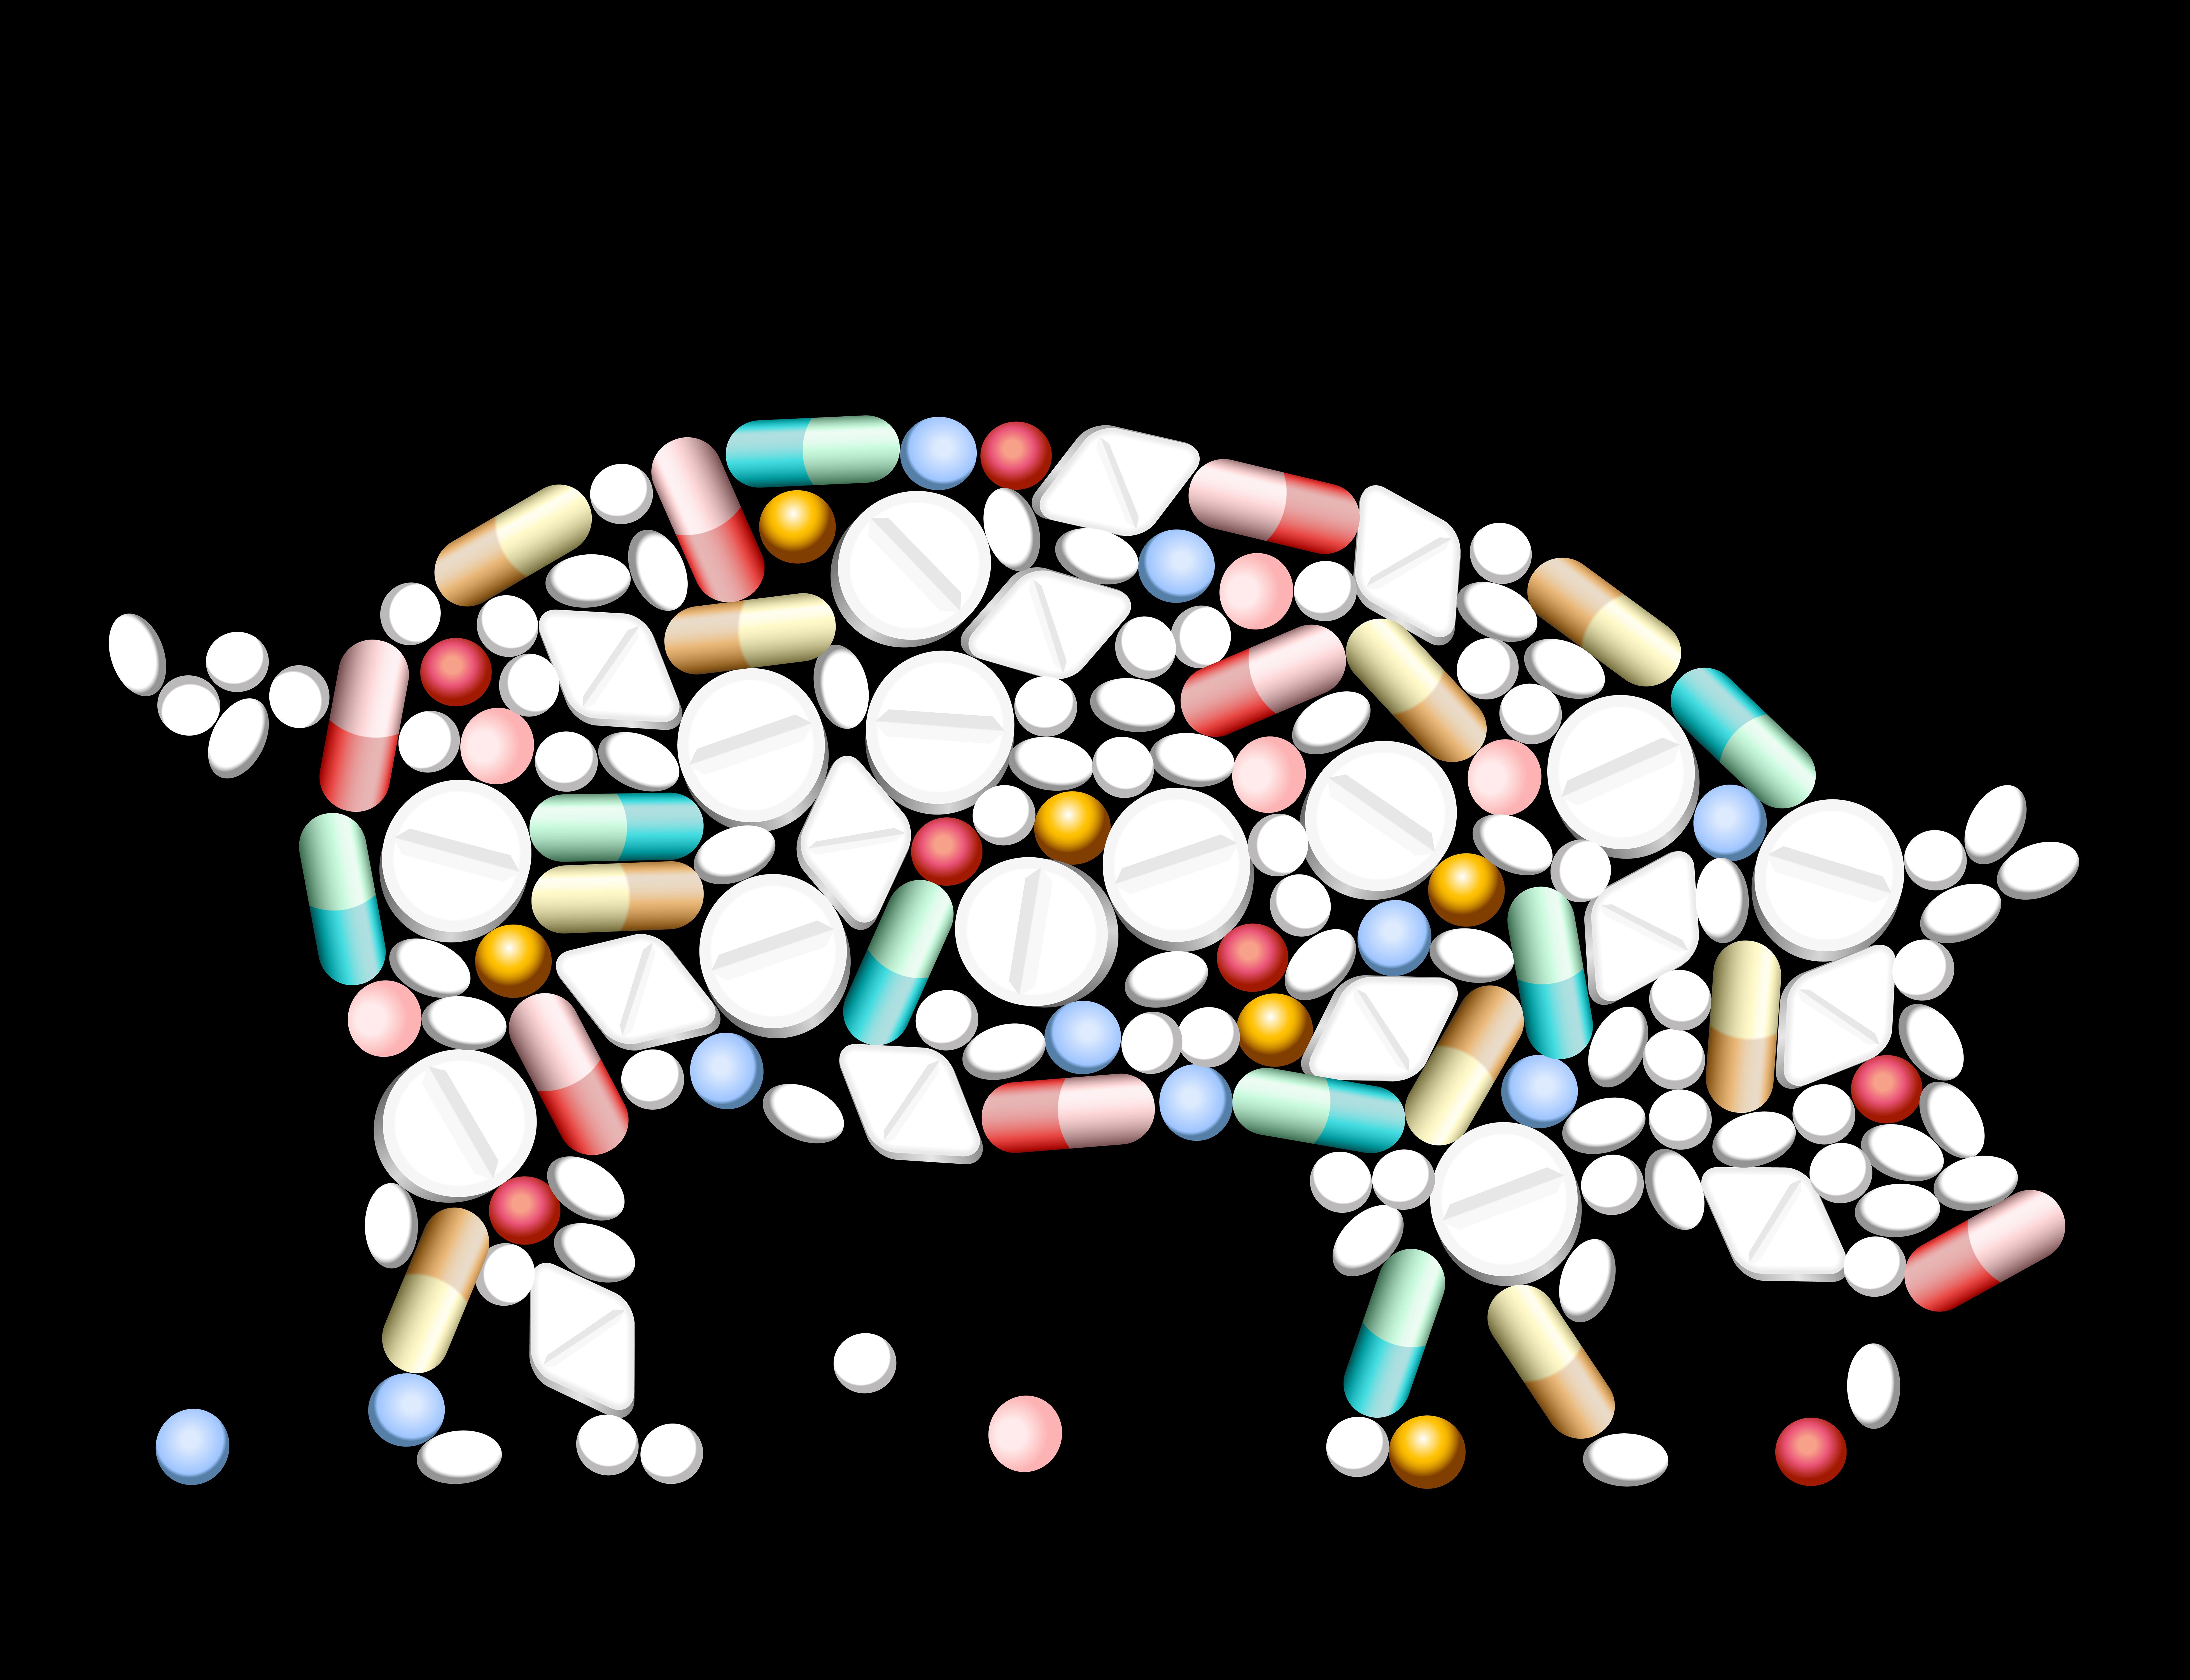 AntibioticsInYourMeat_WellnessWarriors.jpg